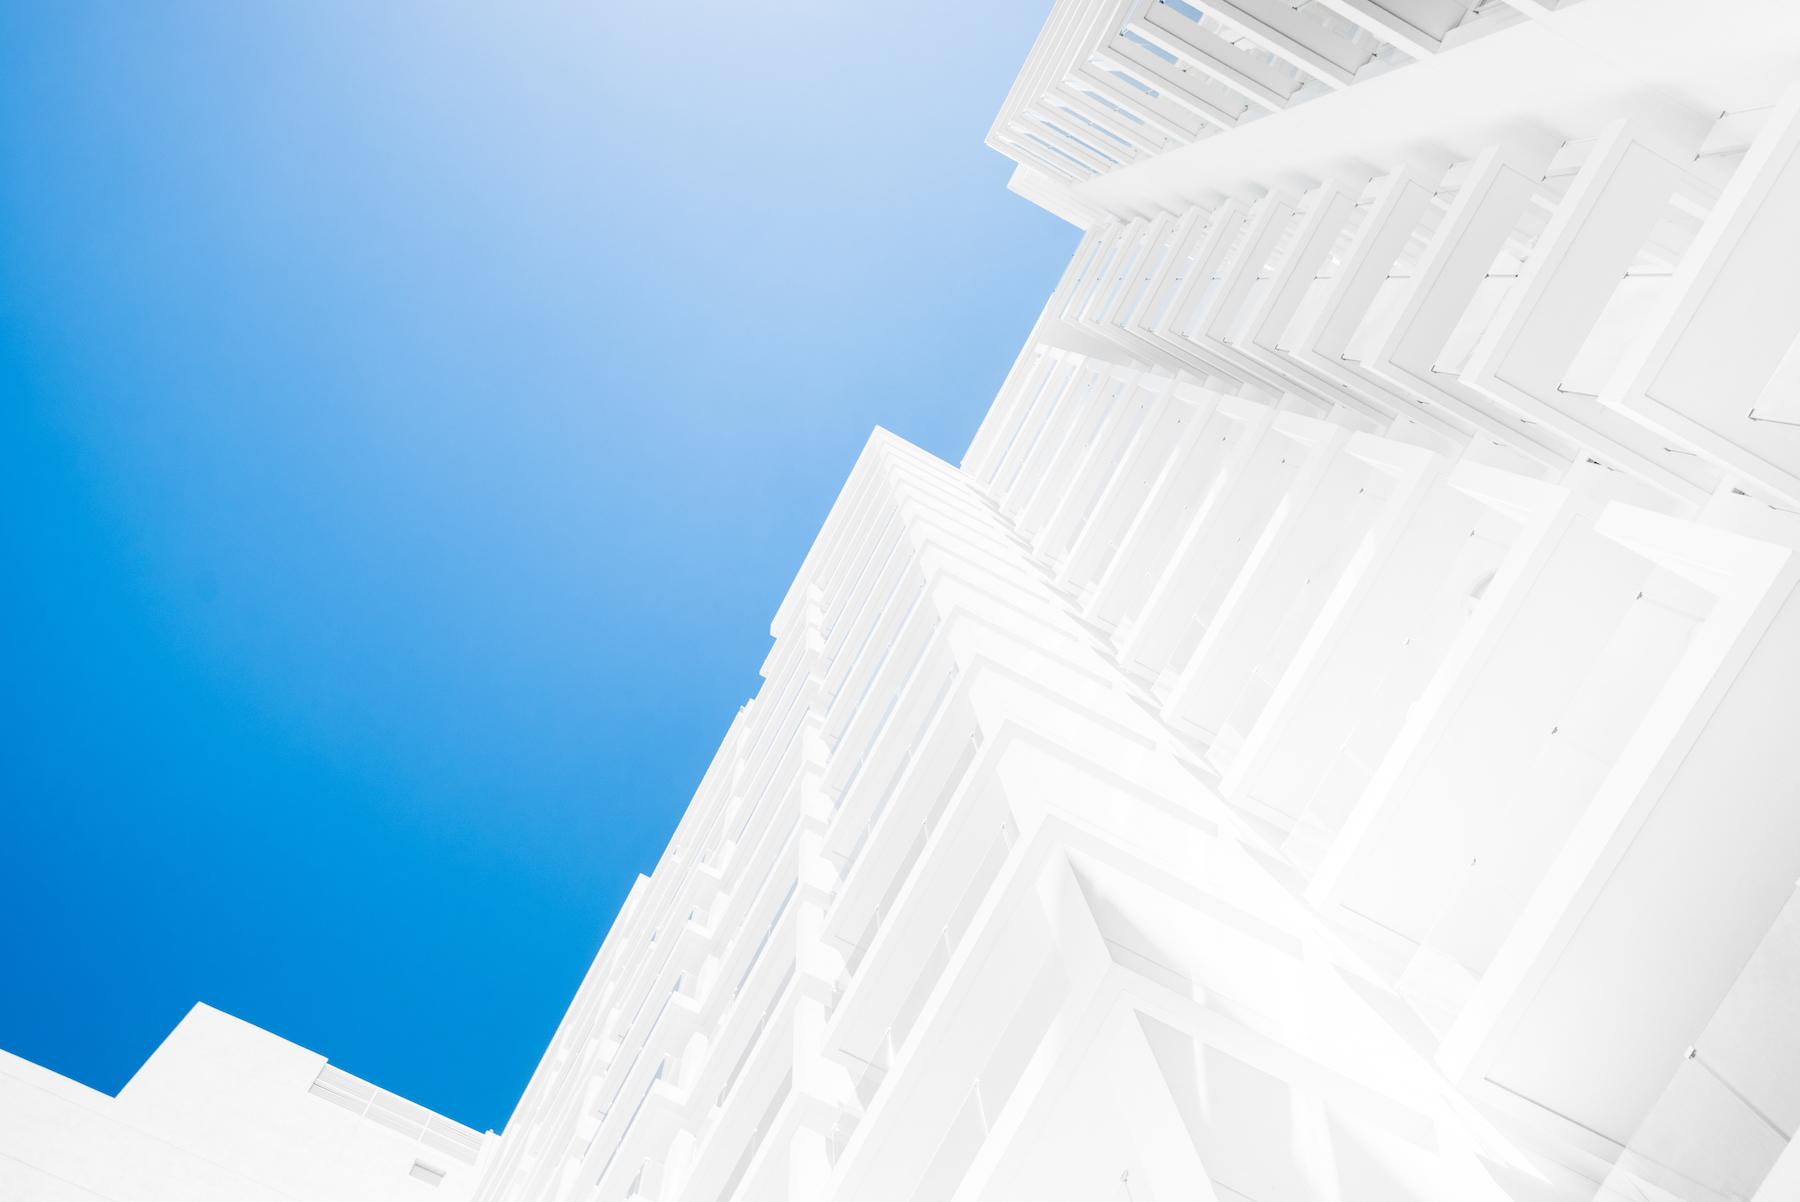 dubai-minimalist-building-architecture-thomas-drouault-portfolio.jpg